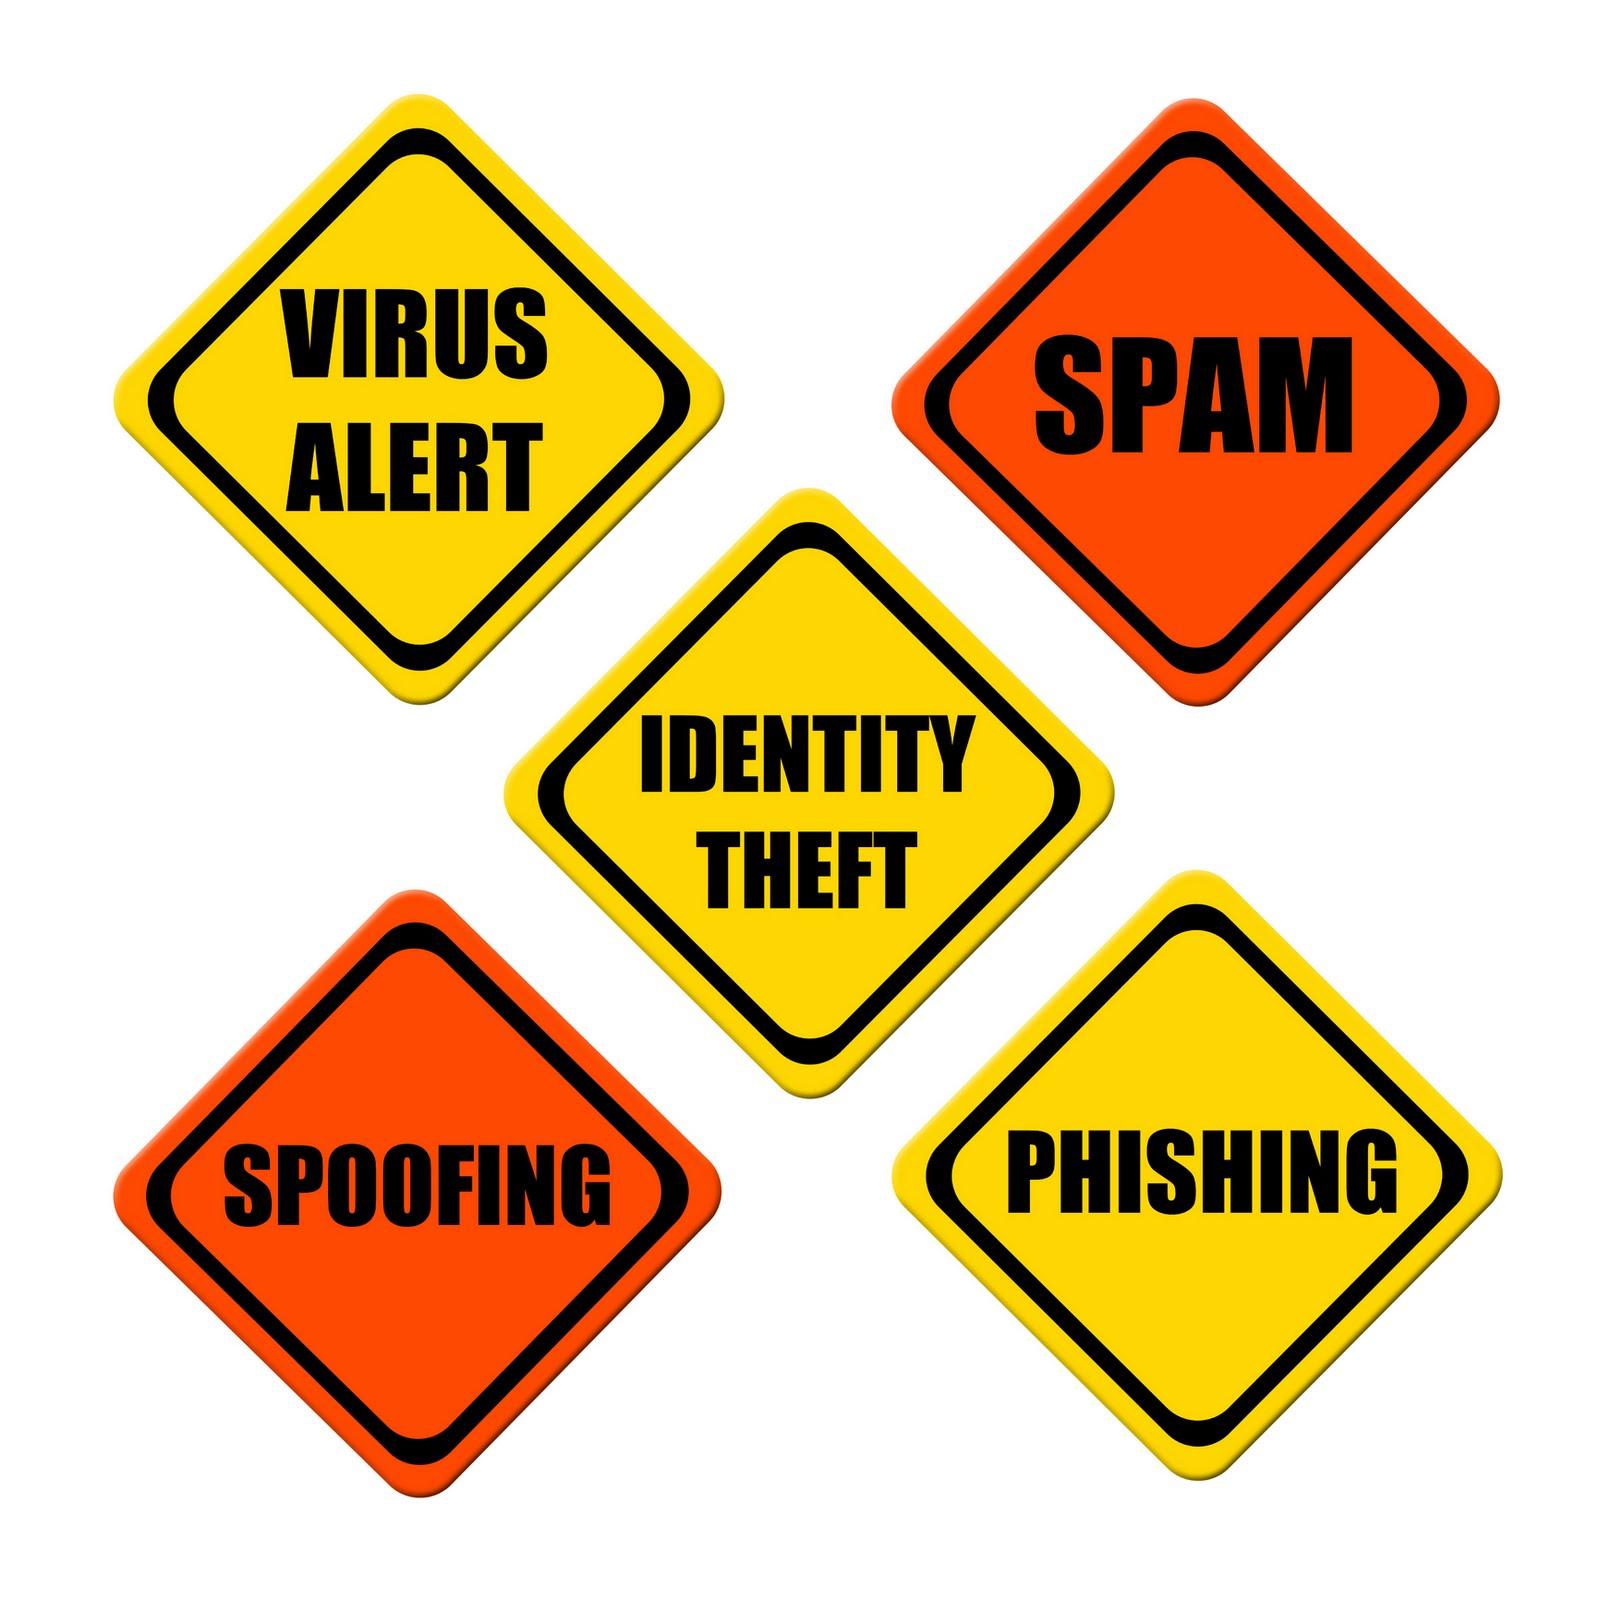 Risks: THE INTERNET: RISKS